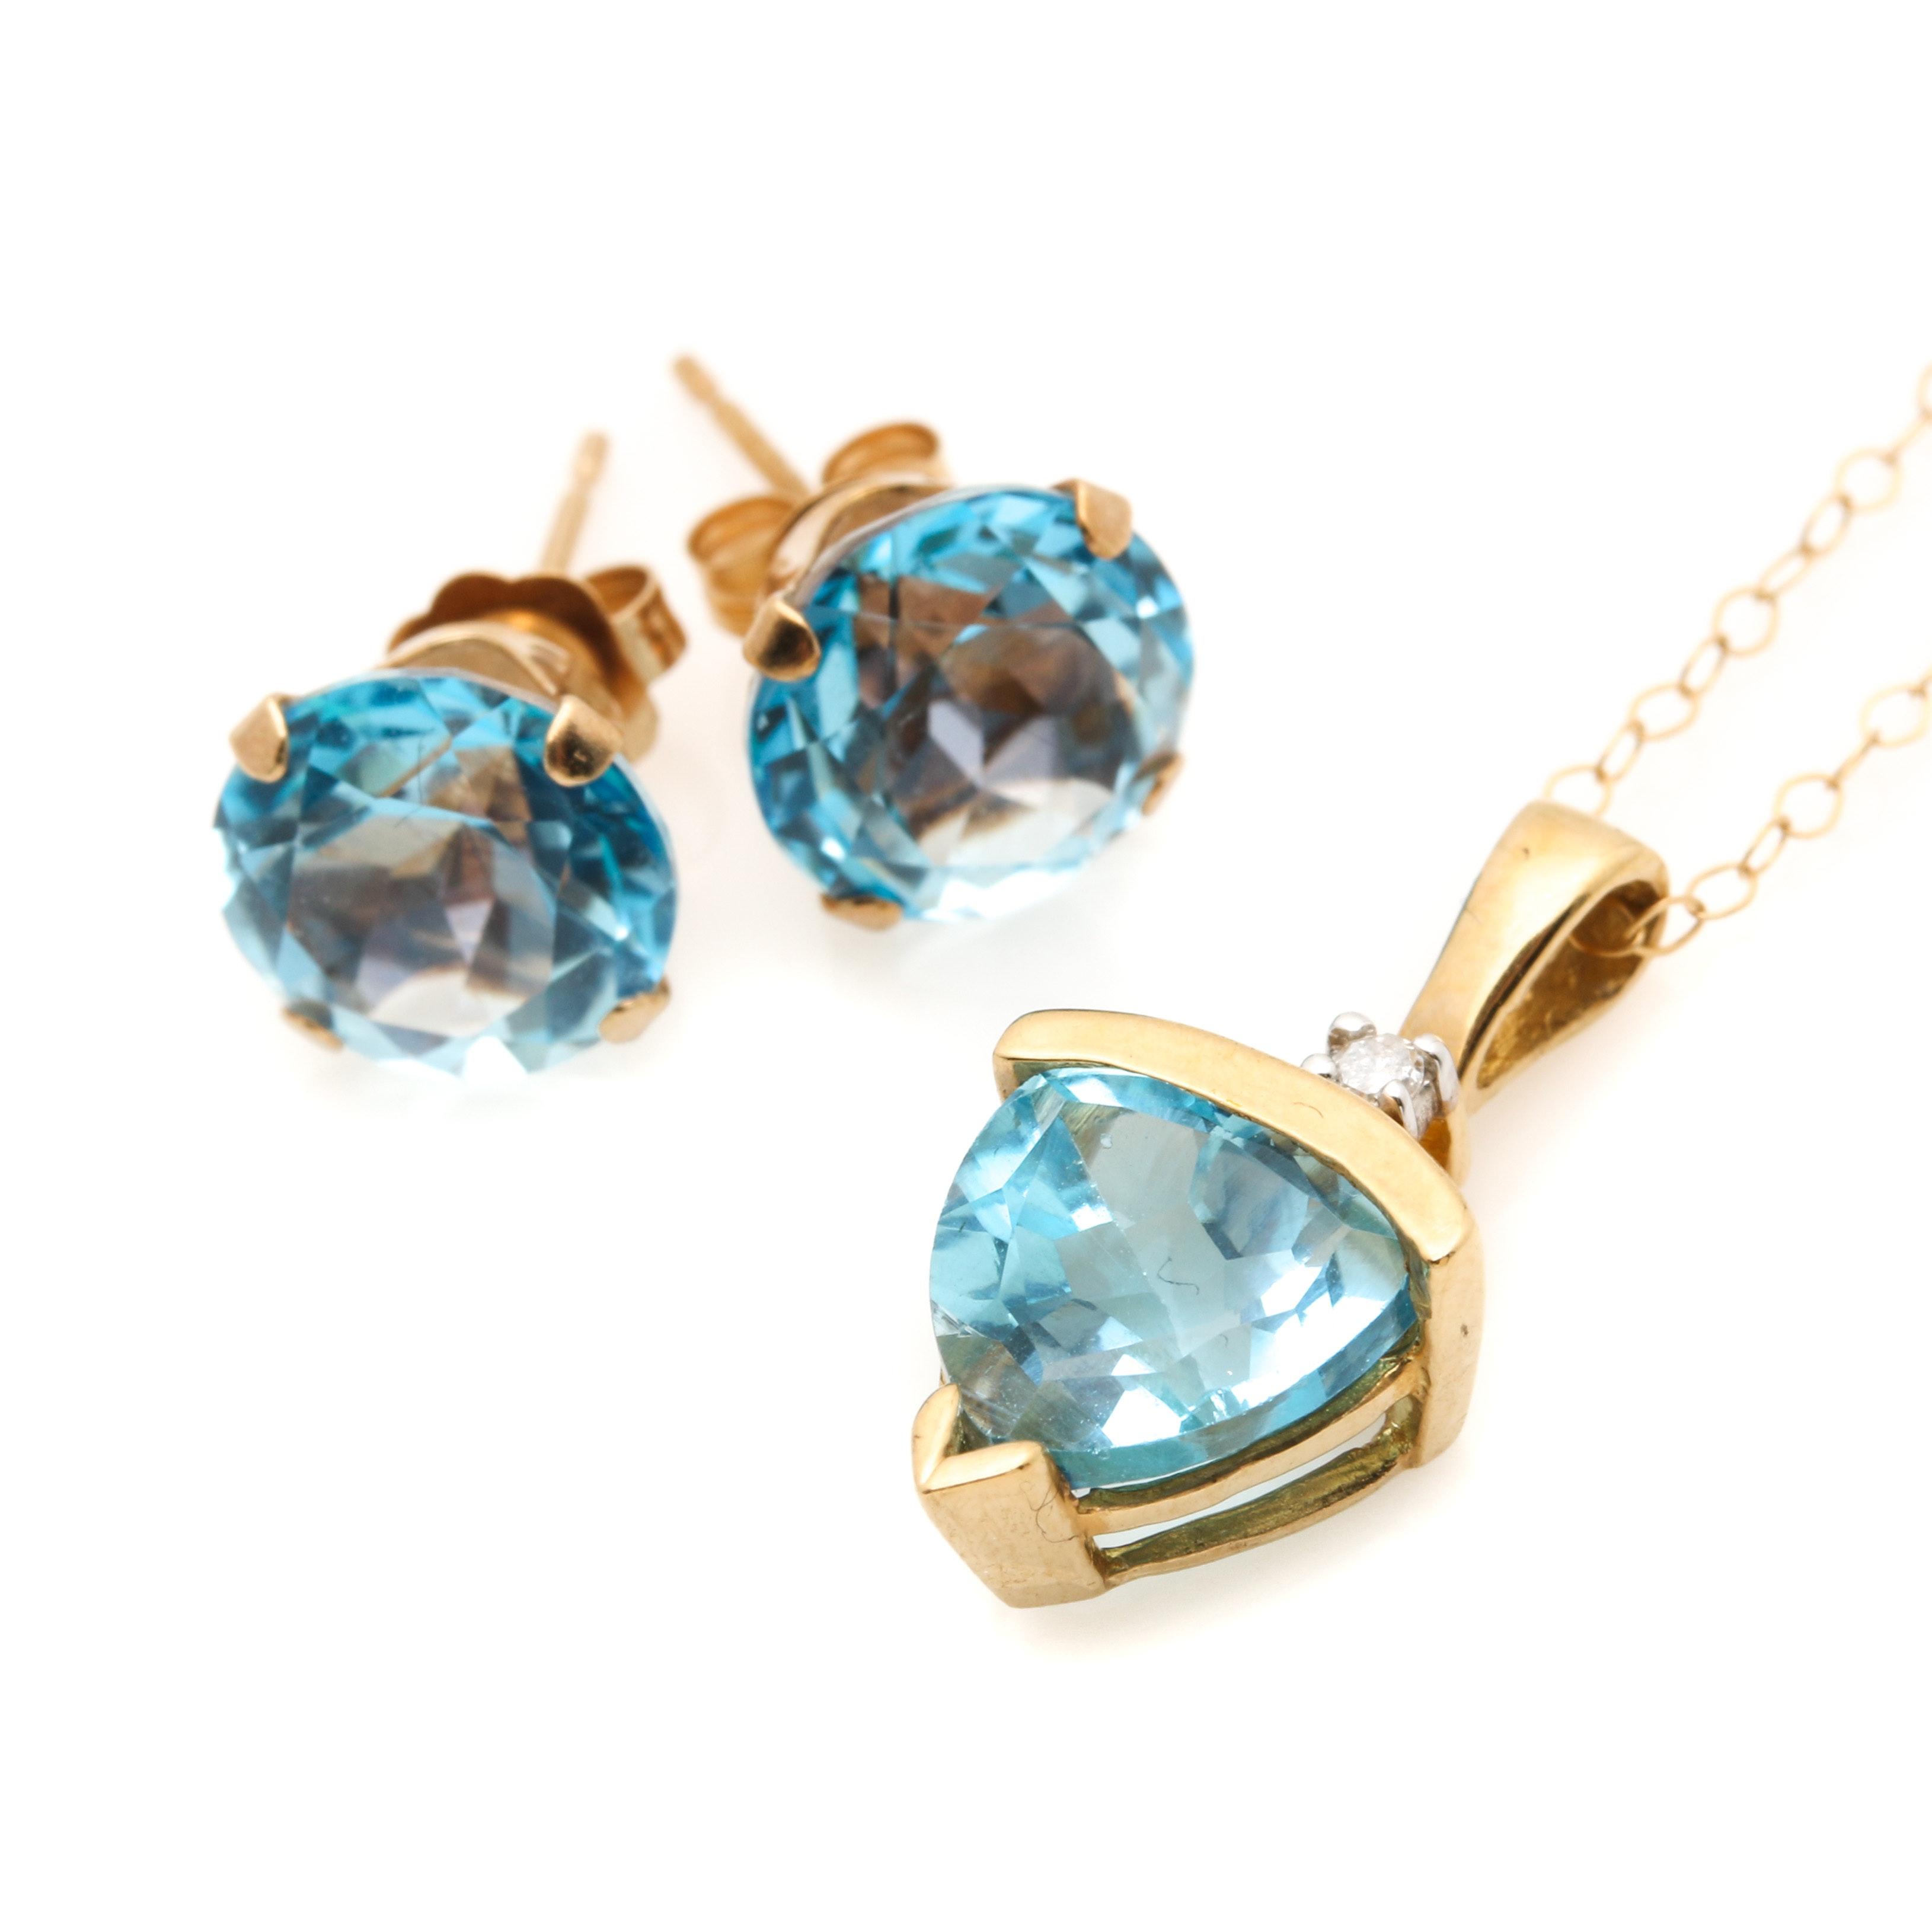 10K Yellow Gold Topaz and Diamond Jewelry Selection